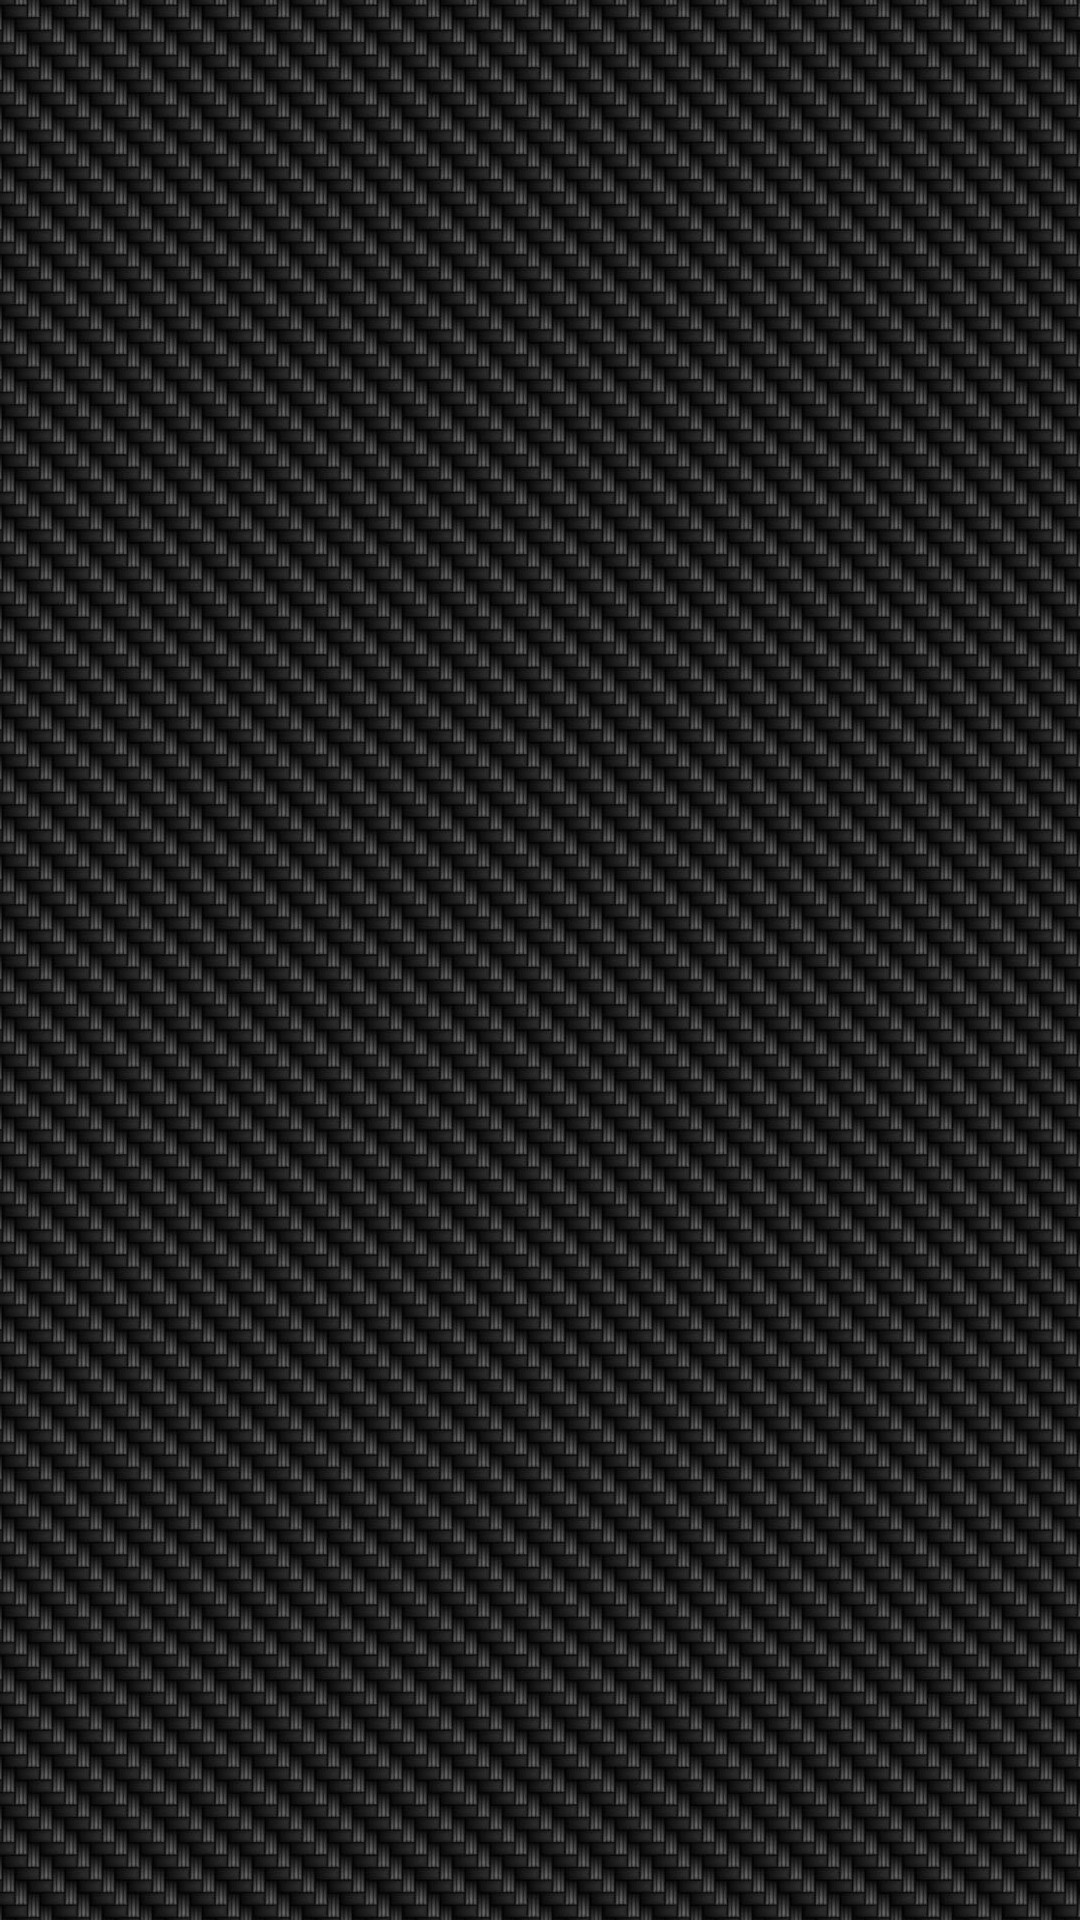 1080 x 1920 wallpaper entertainment: 1080x1920 Wallpapers